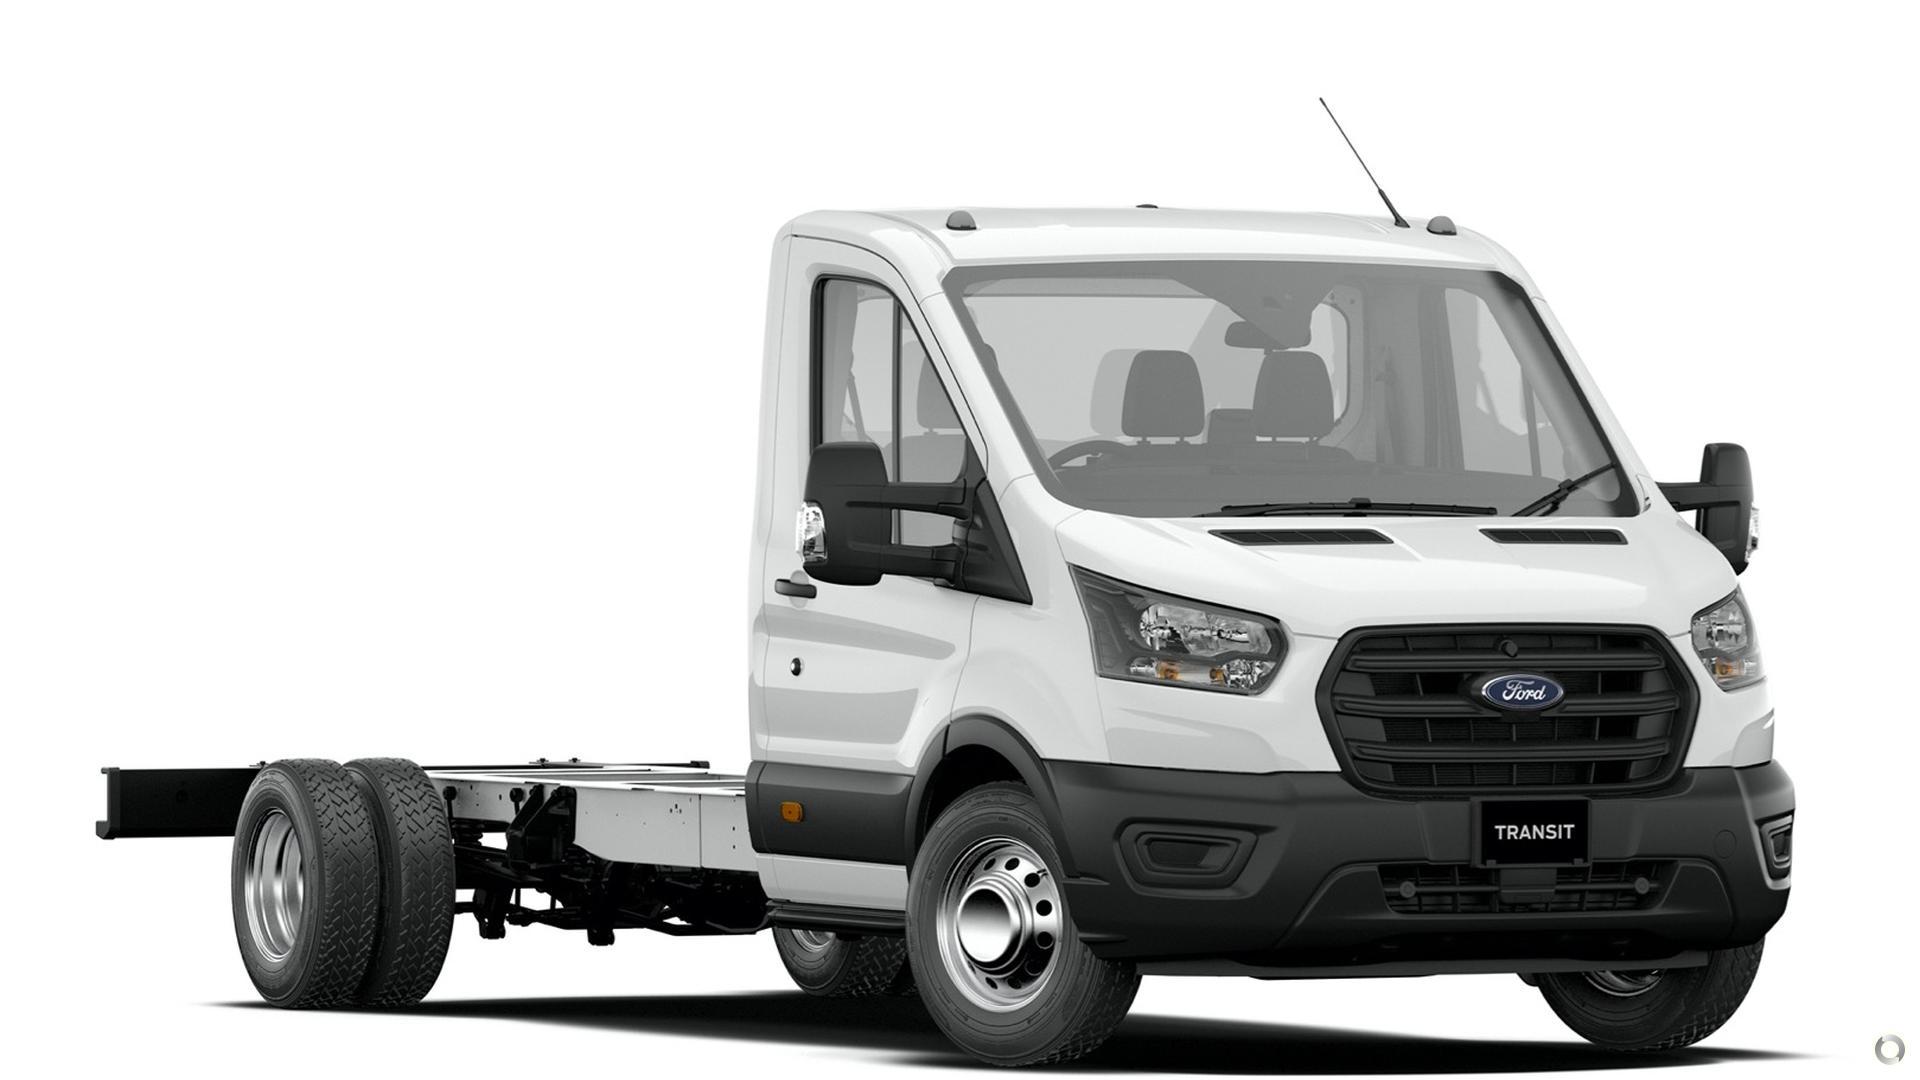 2020 Ford Transit 430E VO